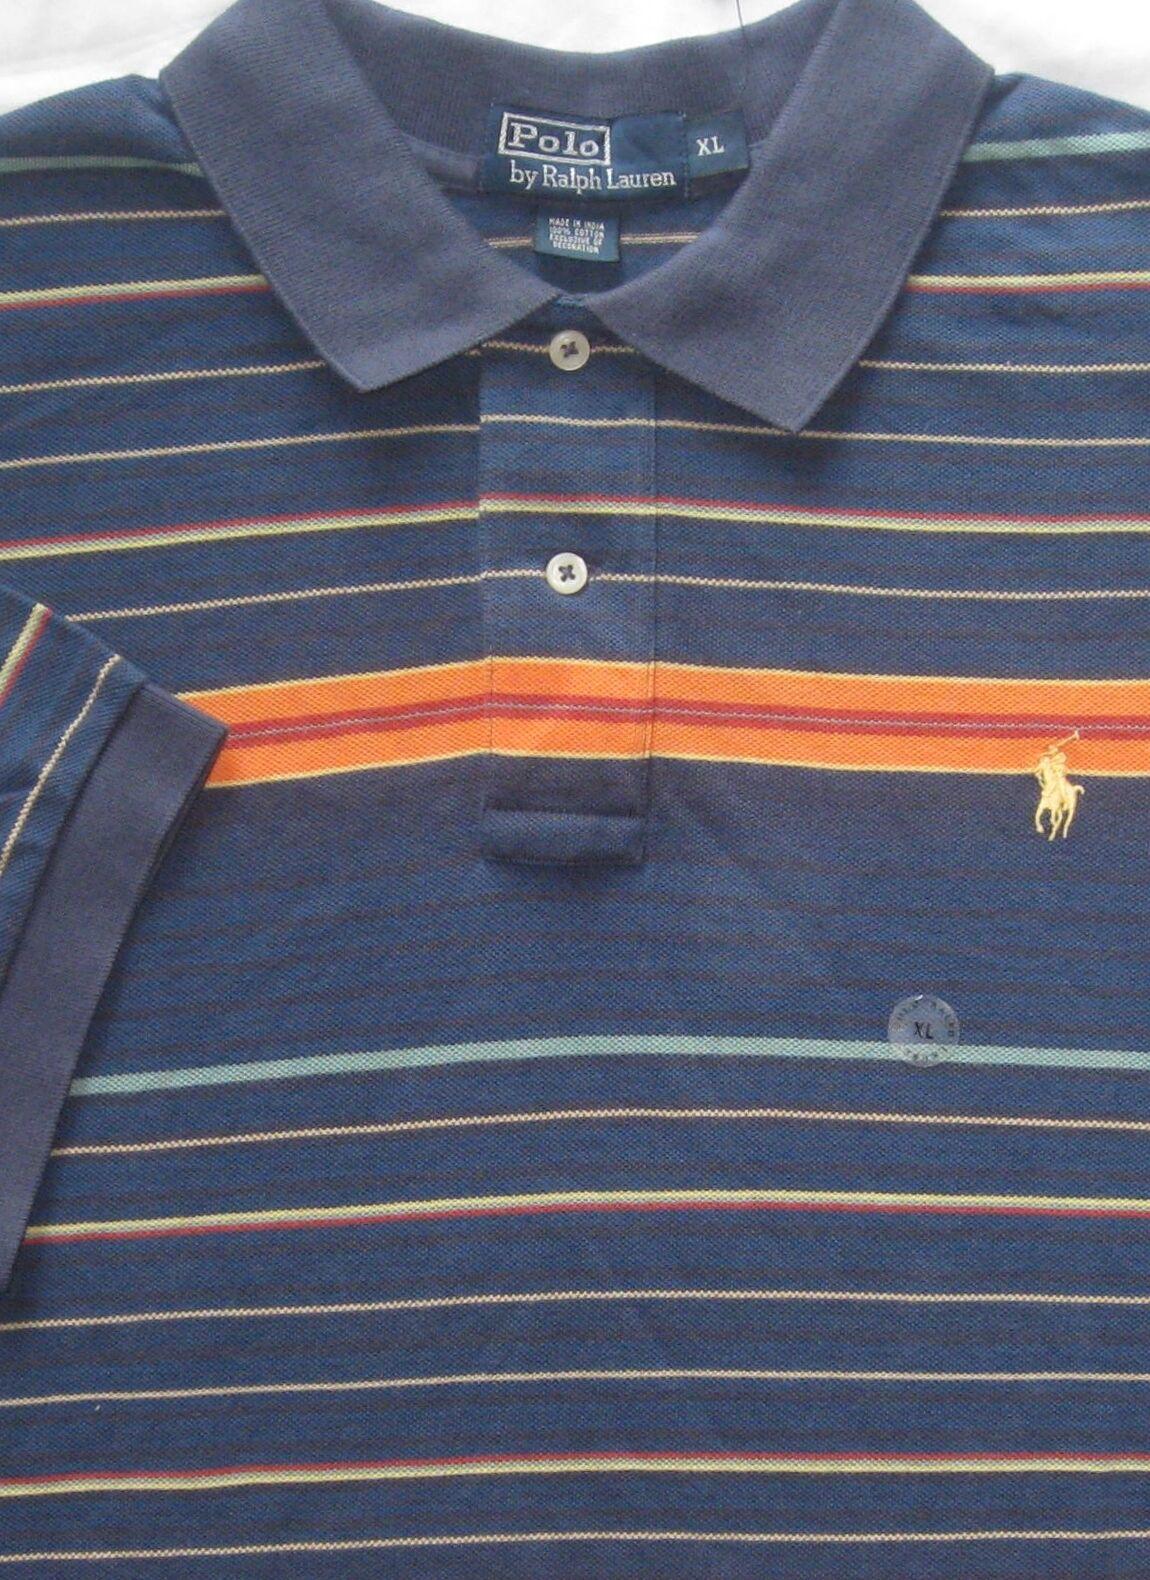 9f749d3c925c New Polo Ralph Lauren bluee Multi Striped Cotton Mesh Polo Shirt XL. Orvis  ...